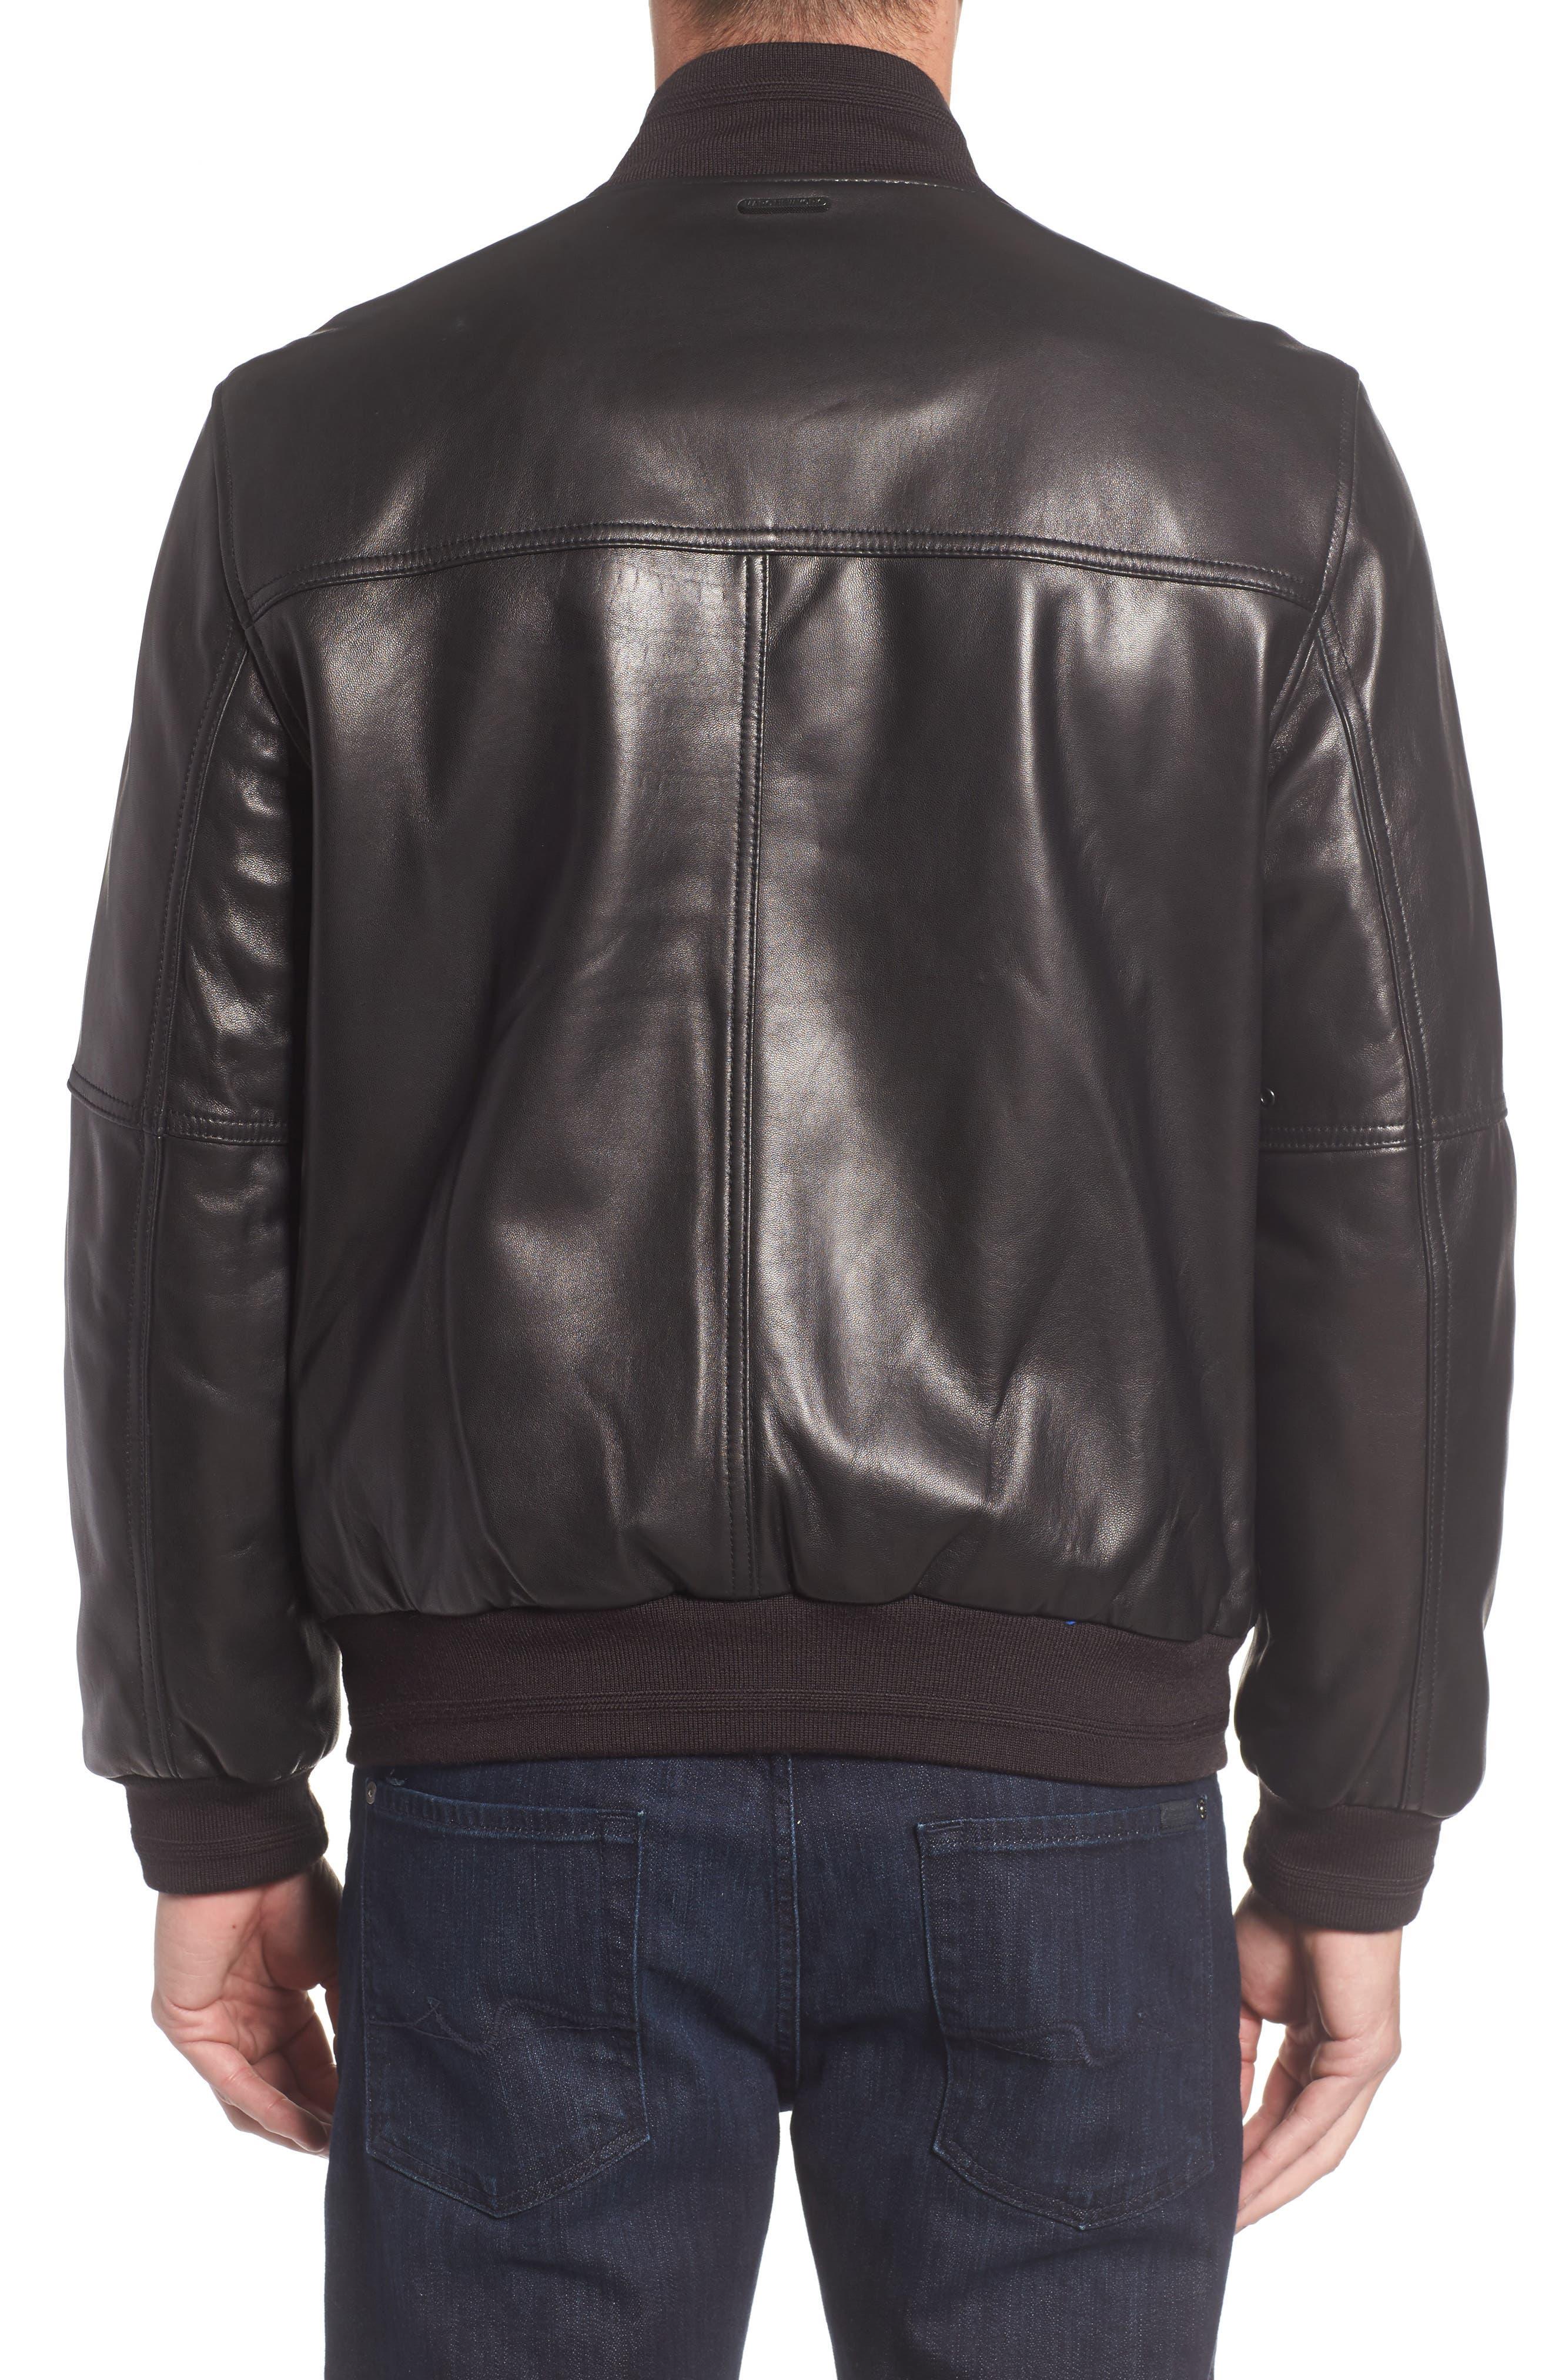 MARC NEW YORK, Summit Leather Jacket, Alternate thumbnail 2, color, BLACK